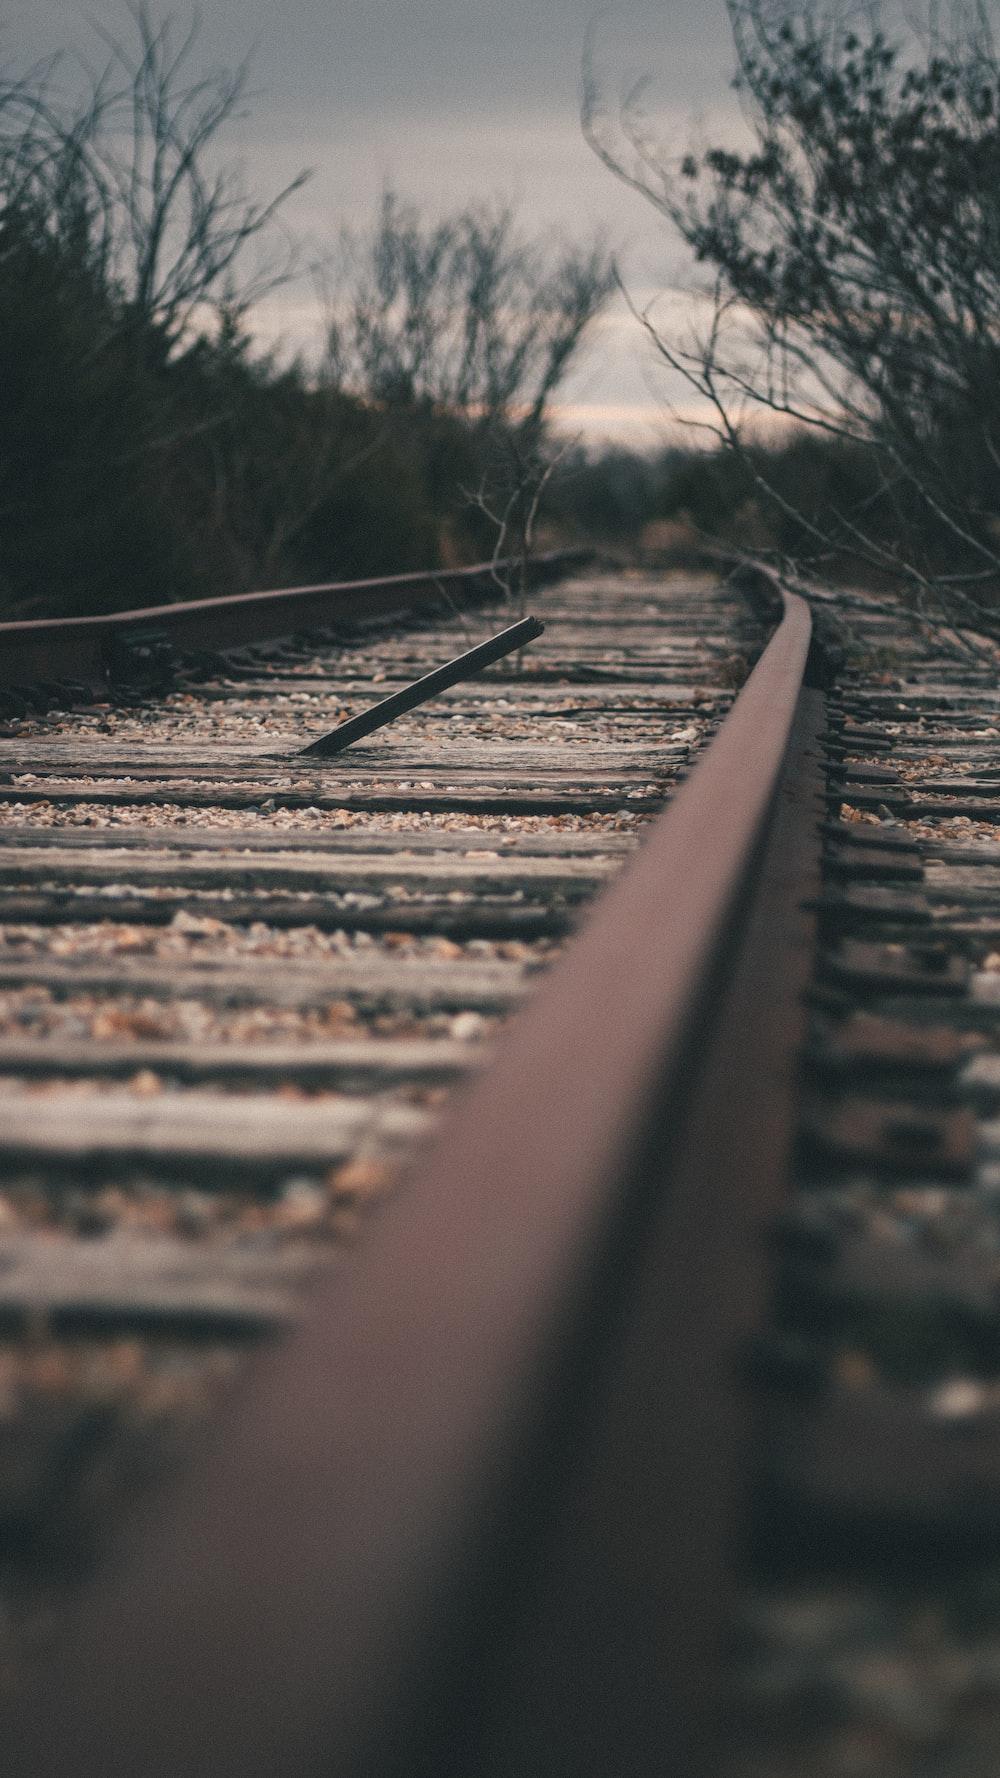 brown train rail during daytime